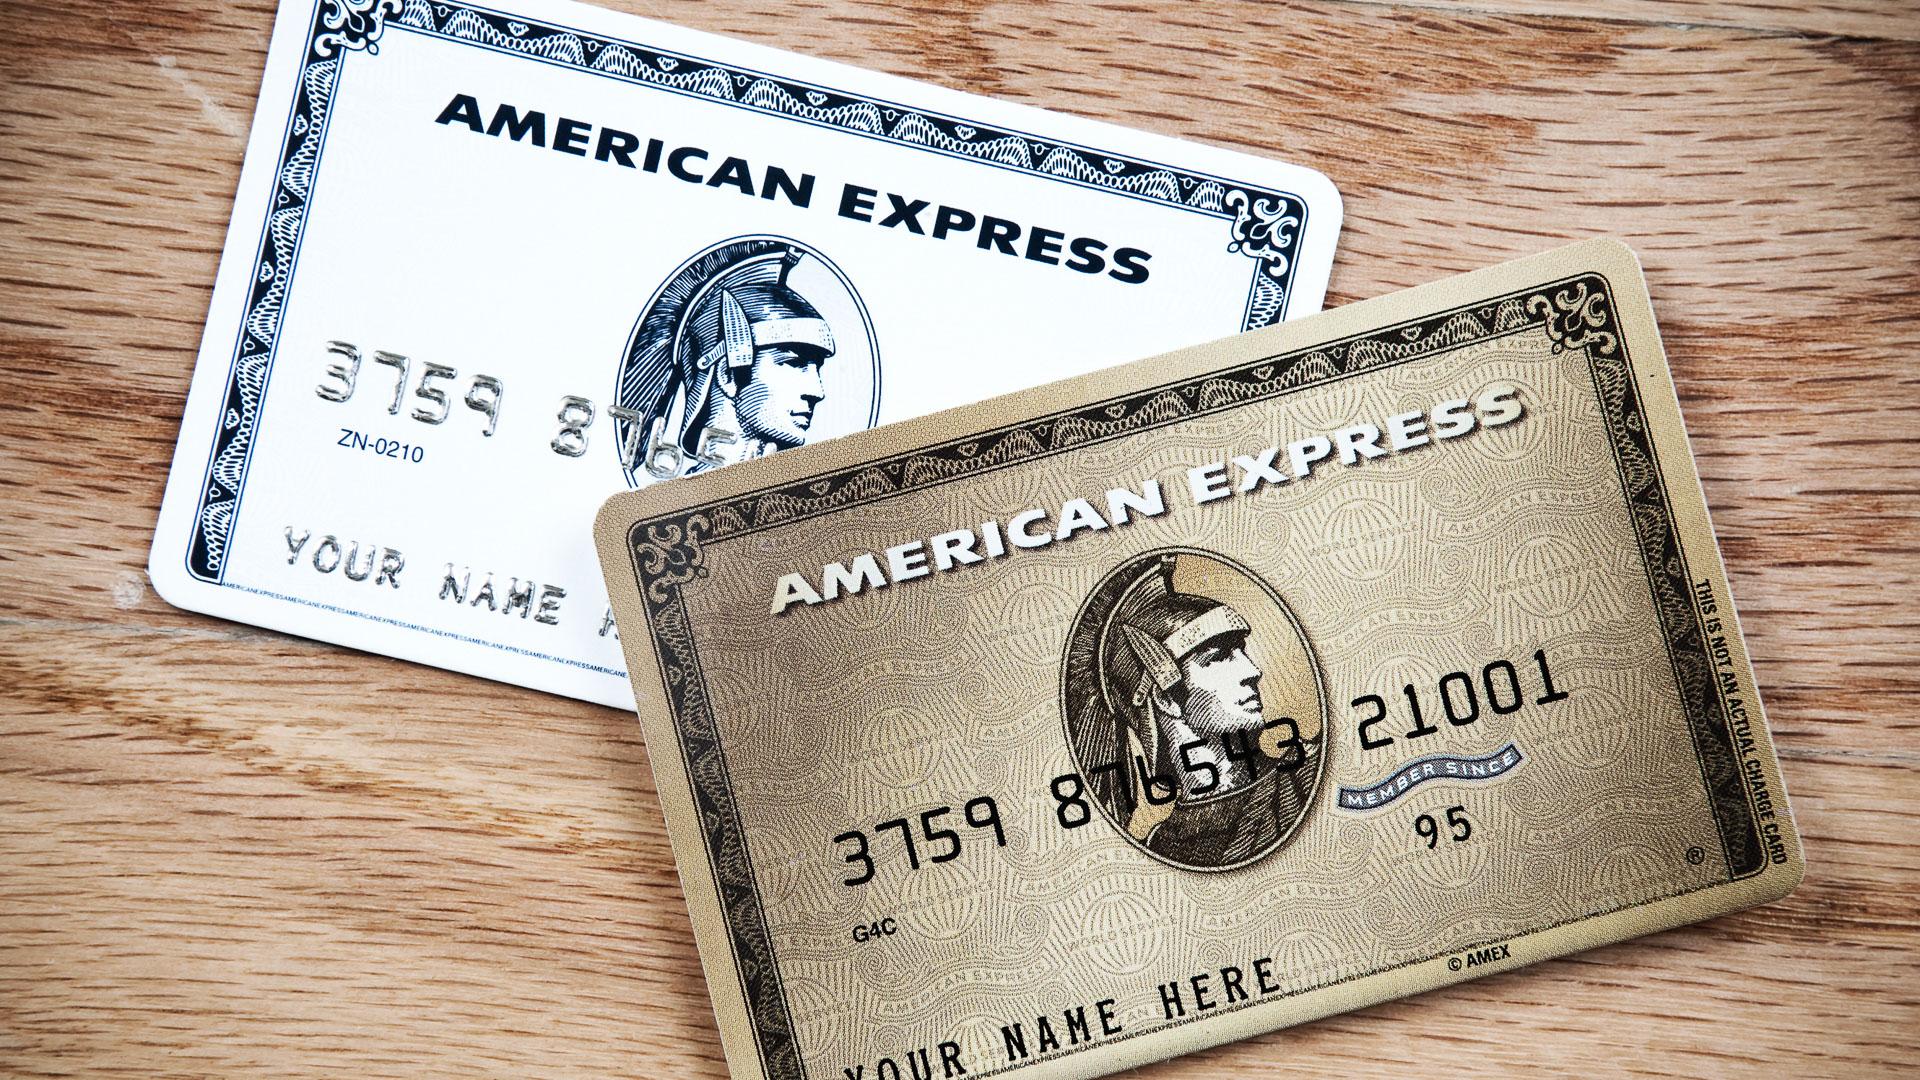 Costco Credit Card Travel Benefits